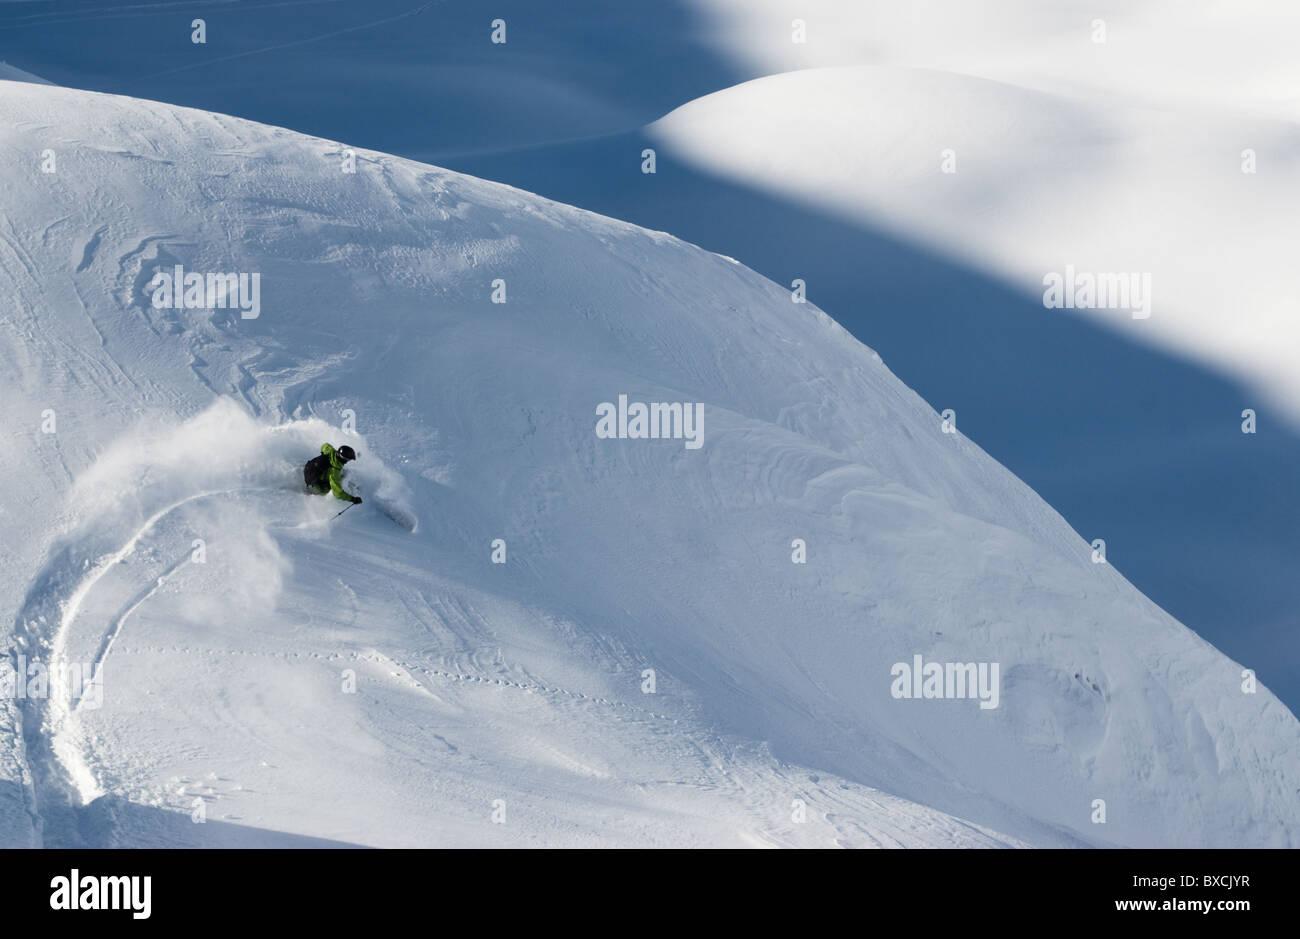 Telemark skier making a turn in powder snow on rugged terrain in Andermatt, Switzerland. - Stock Image